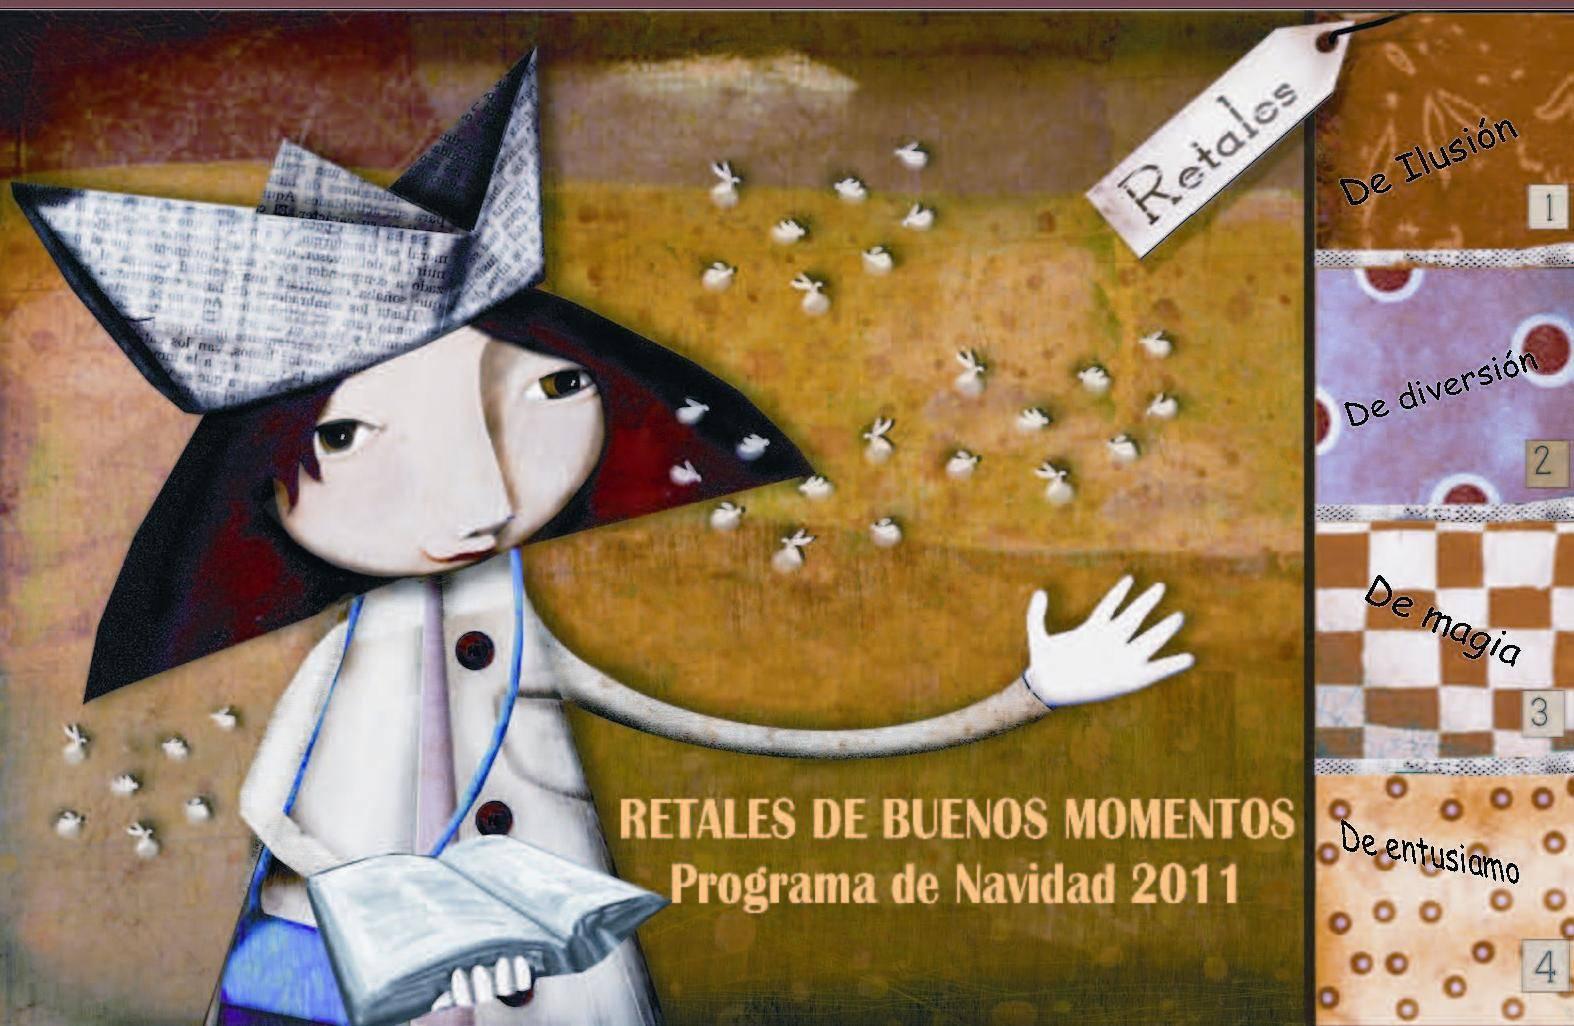 Herencia programa navidad 2011